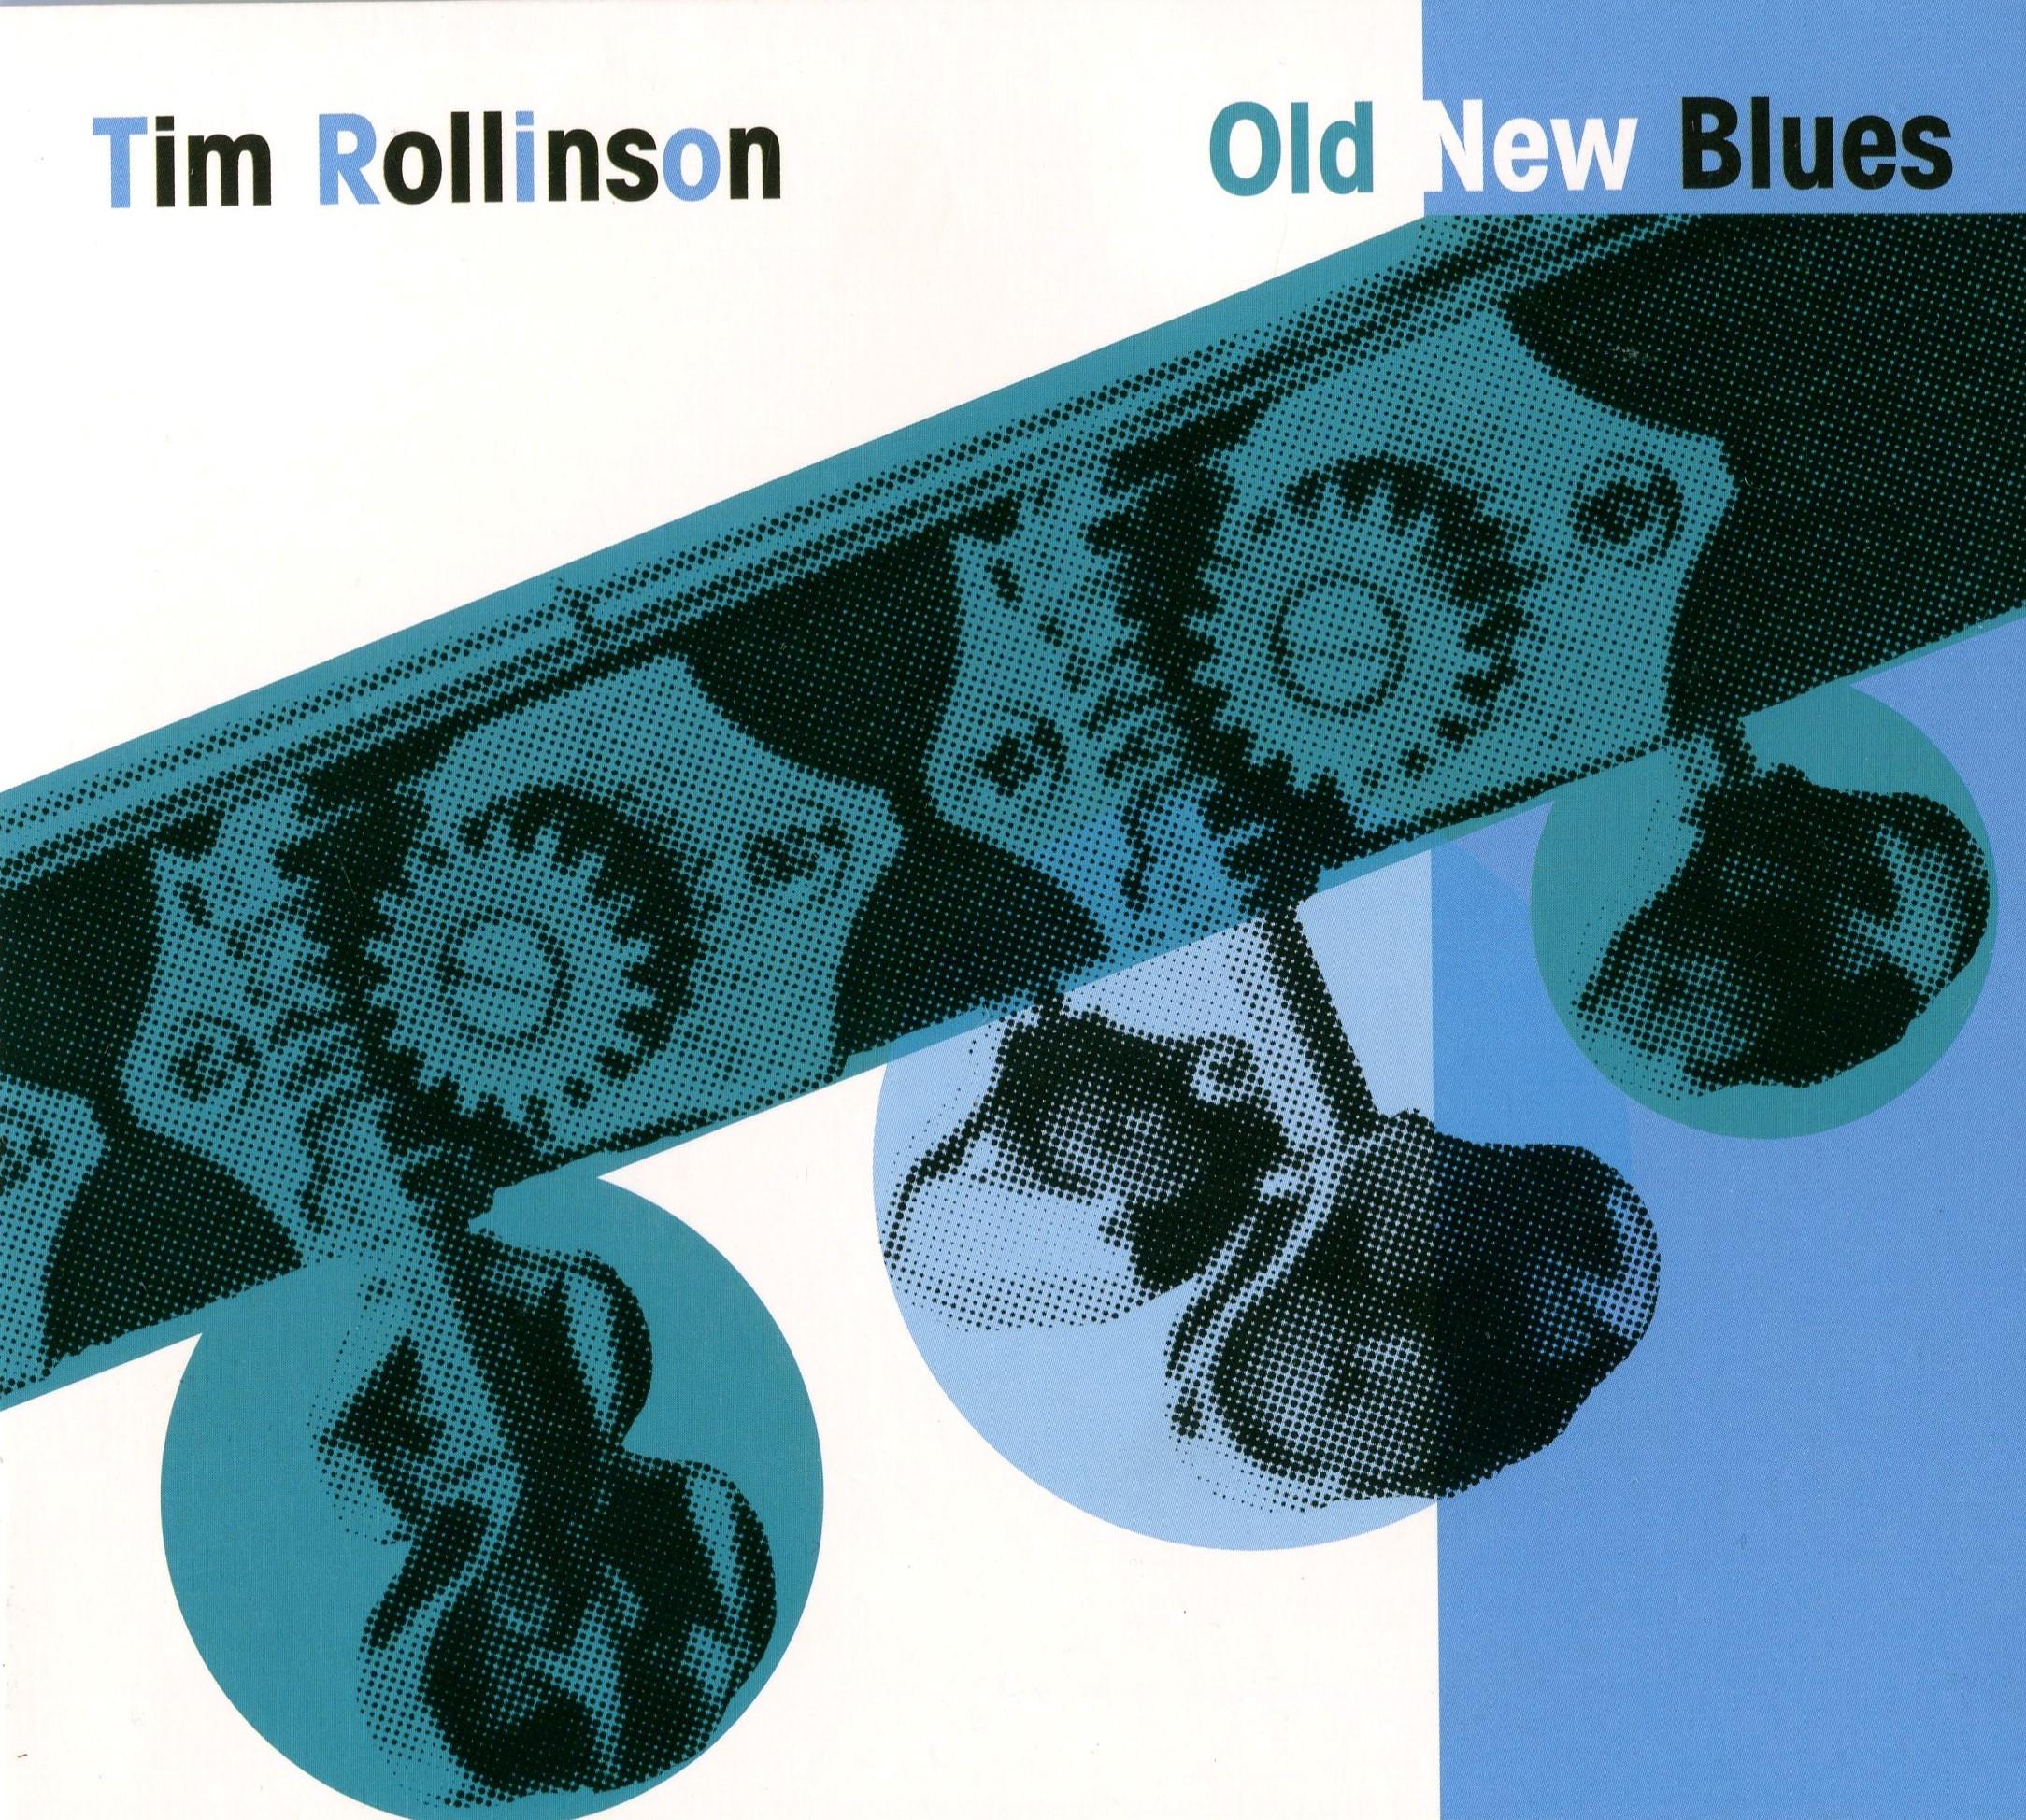 RollinsonTimOldNewBlues.jpg